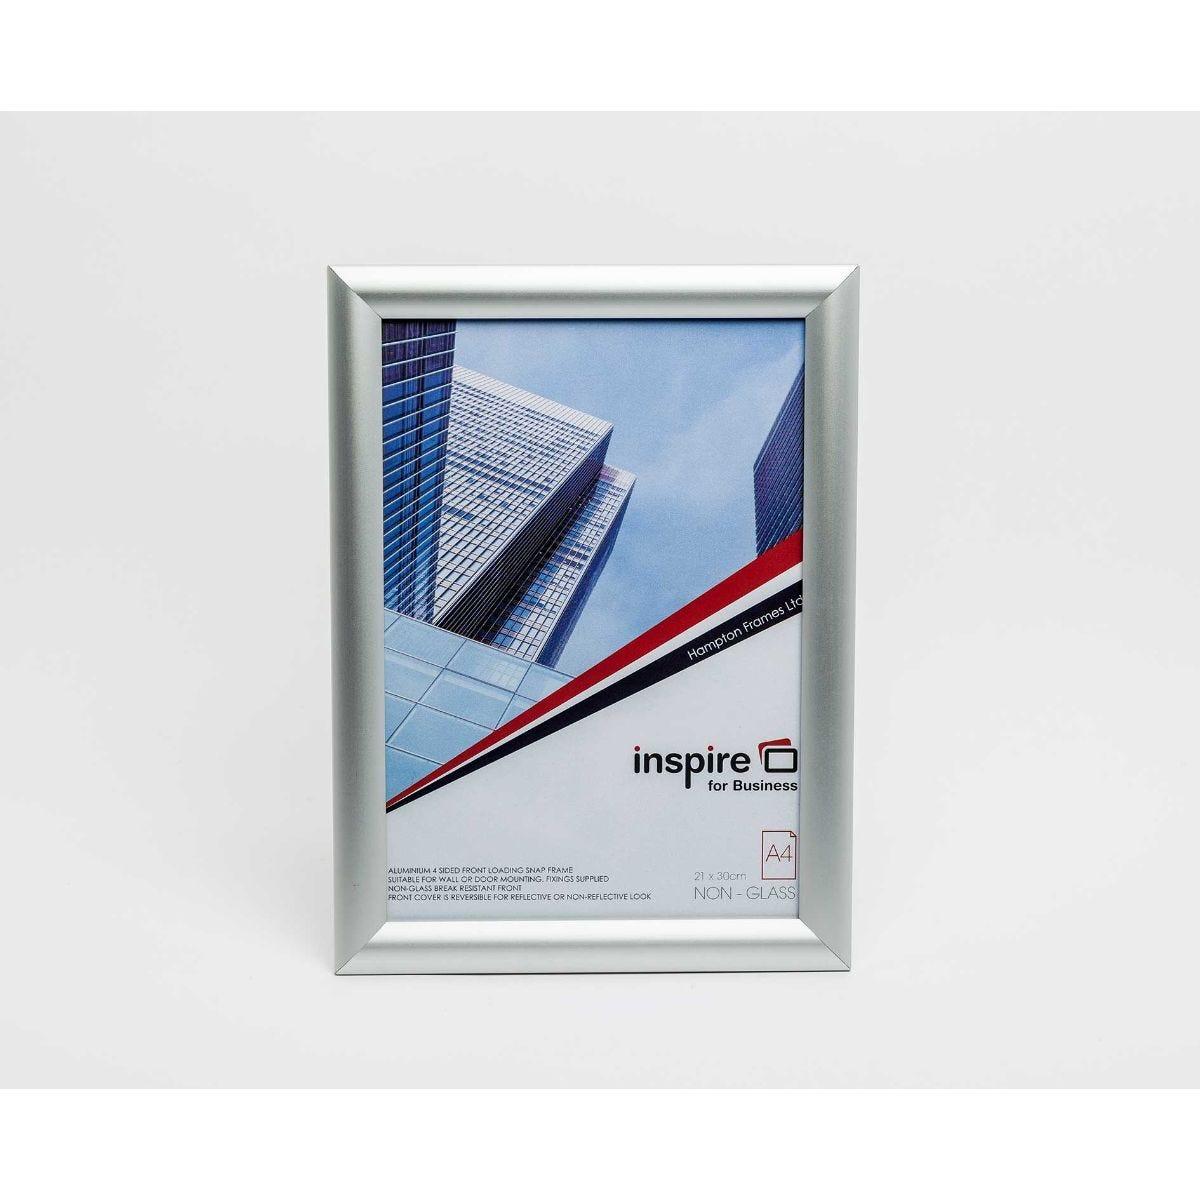 Photo Frames & Albums Gifts Stationery - Ryman